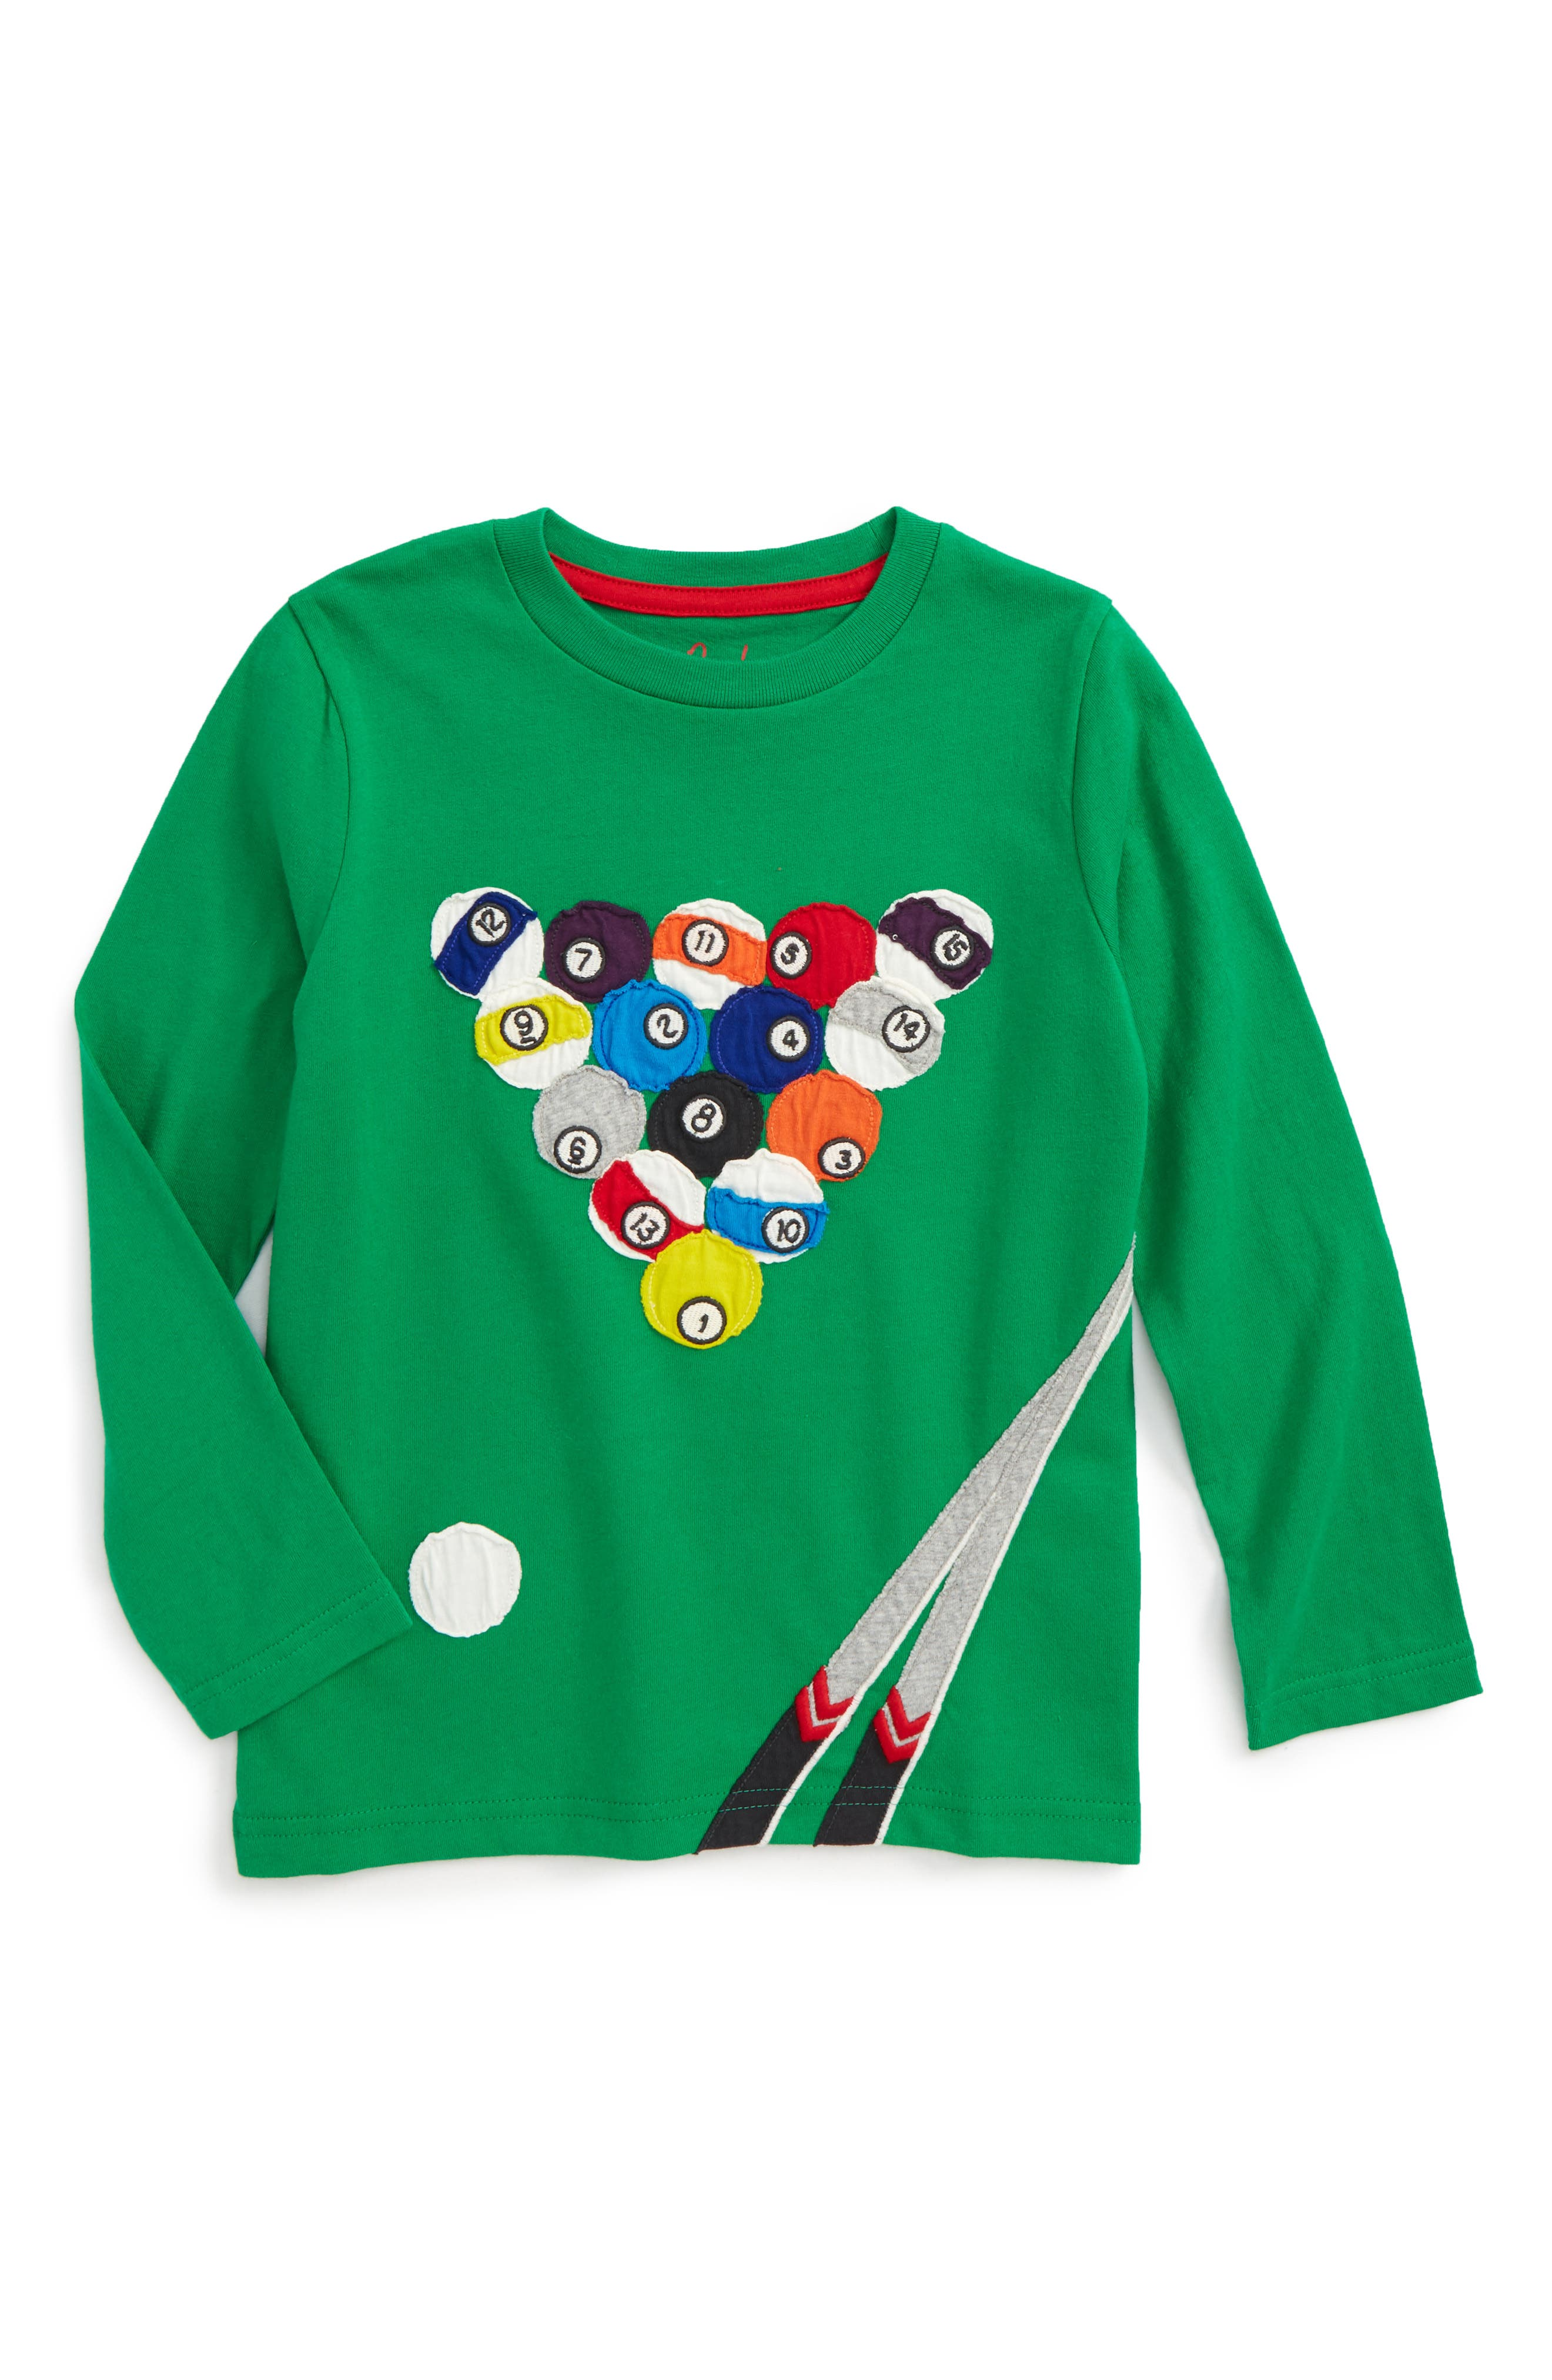 Main Image - Mini Boden Sporty Appliqué T-Shirt (Toddler Boys, Little Boys & Big Boys)